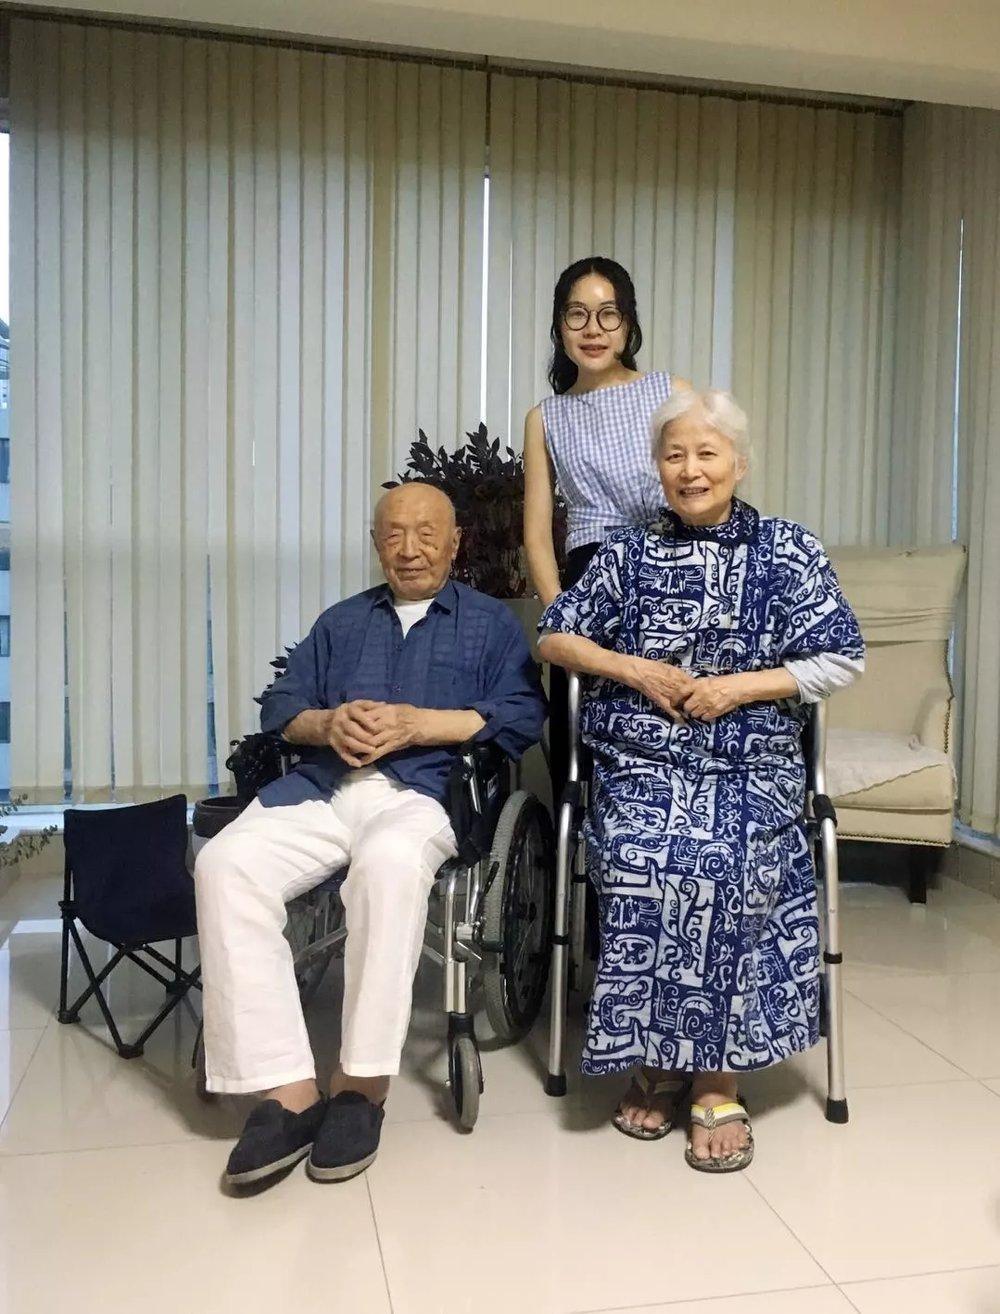 A group photo of Peng Weihua and artist couple Ling Gang and Pang Tao